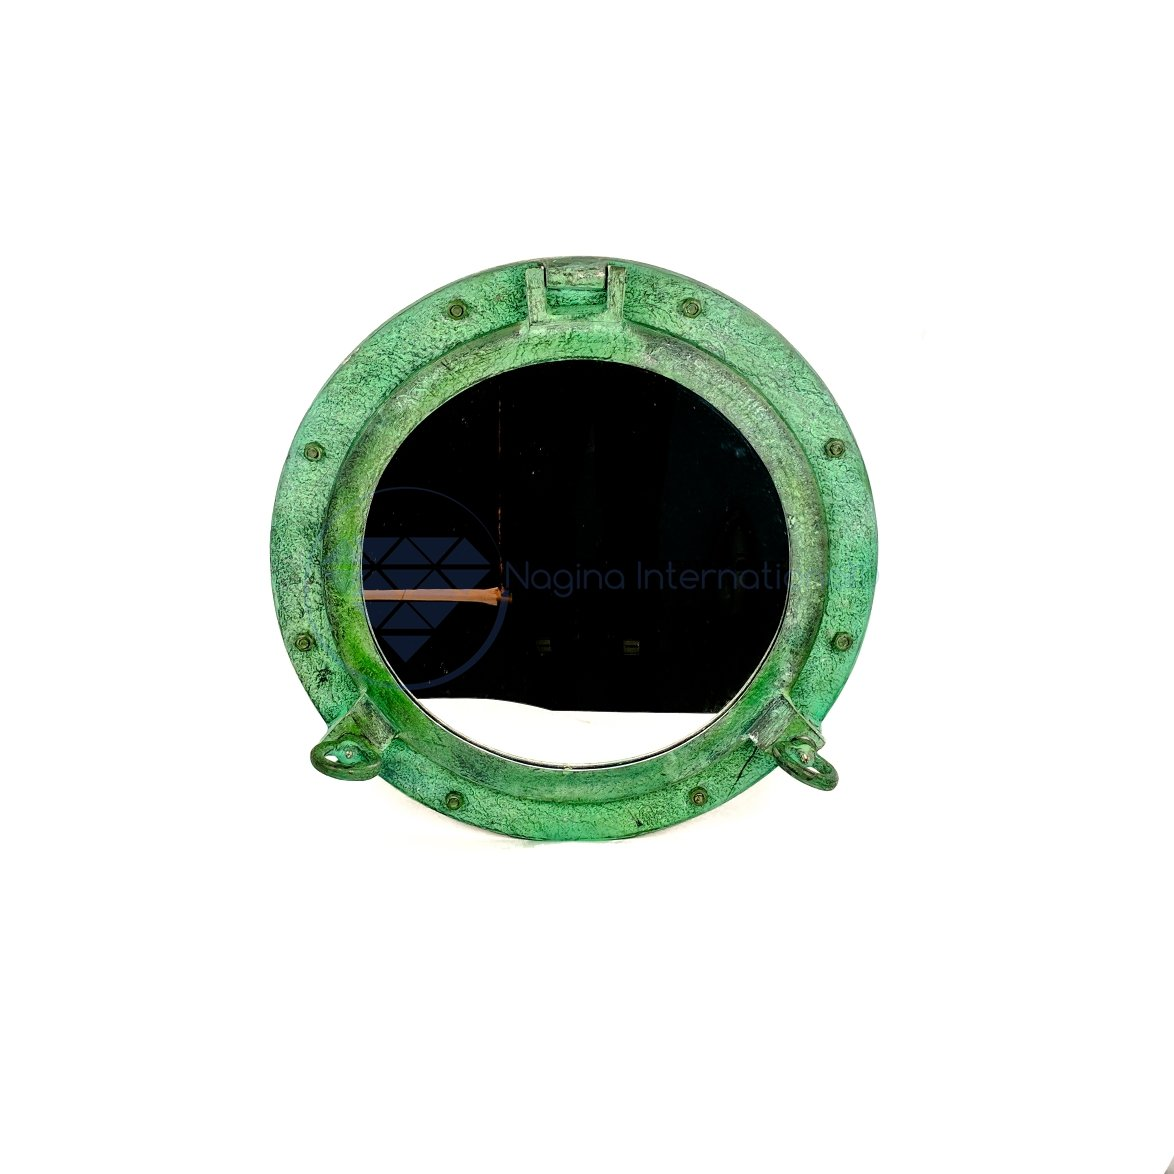 20'' Shipwrecked Premium Aluminum Antique Algae Green Porthole Mirror | Retirement Gift | Nagina International by Nagina International (Image #9)